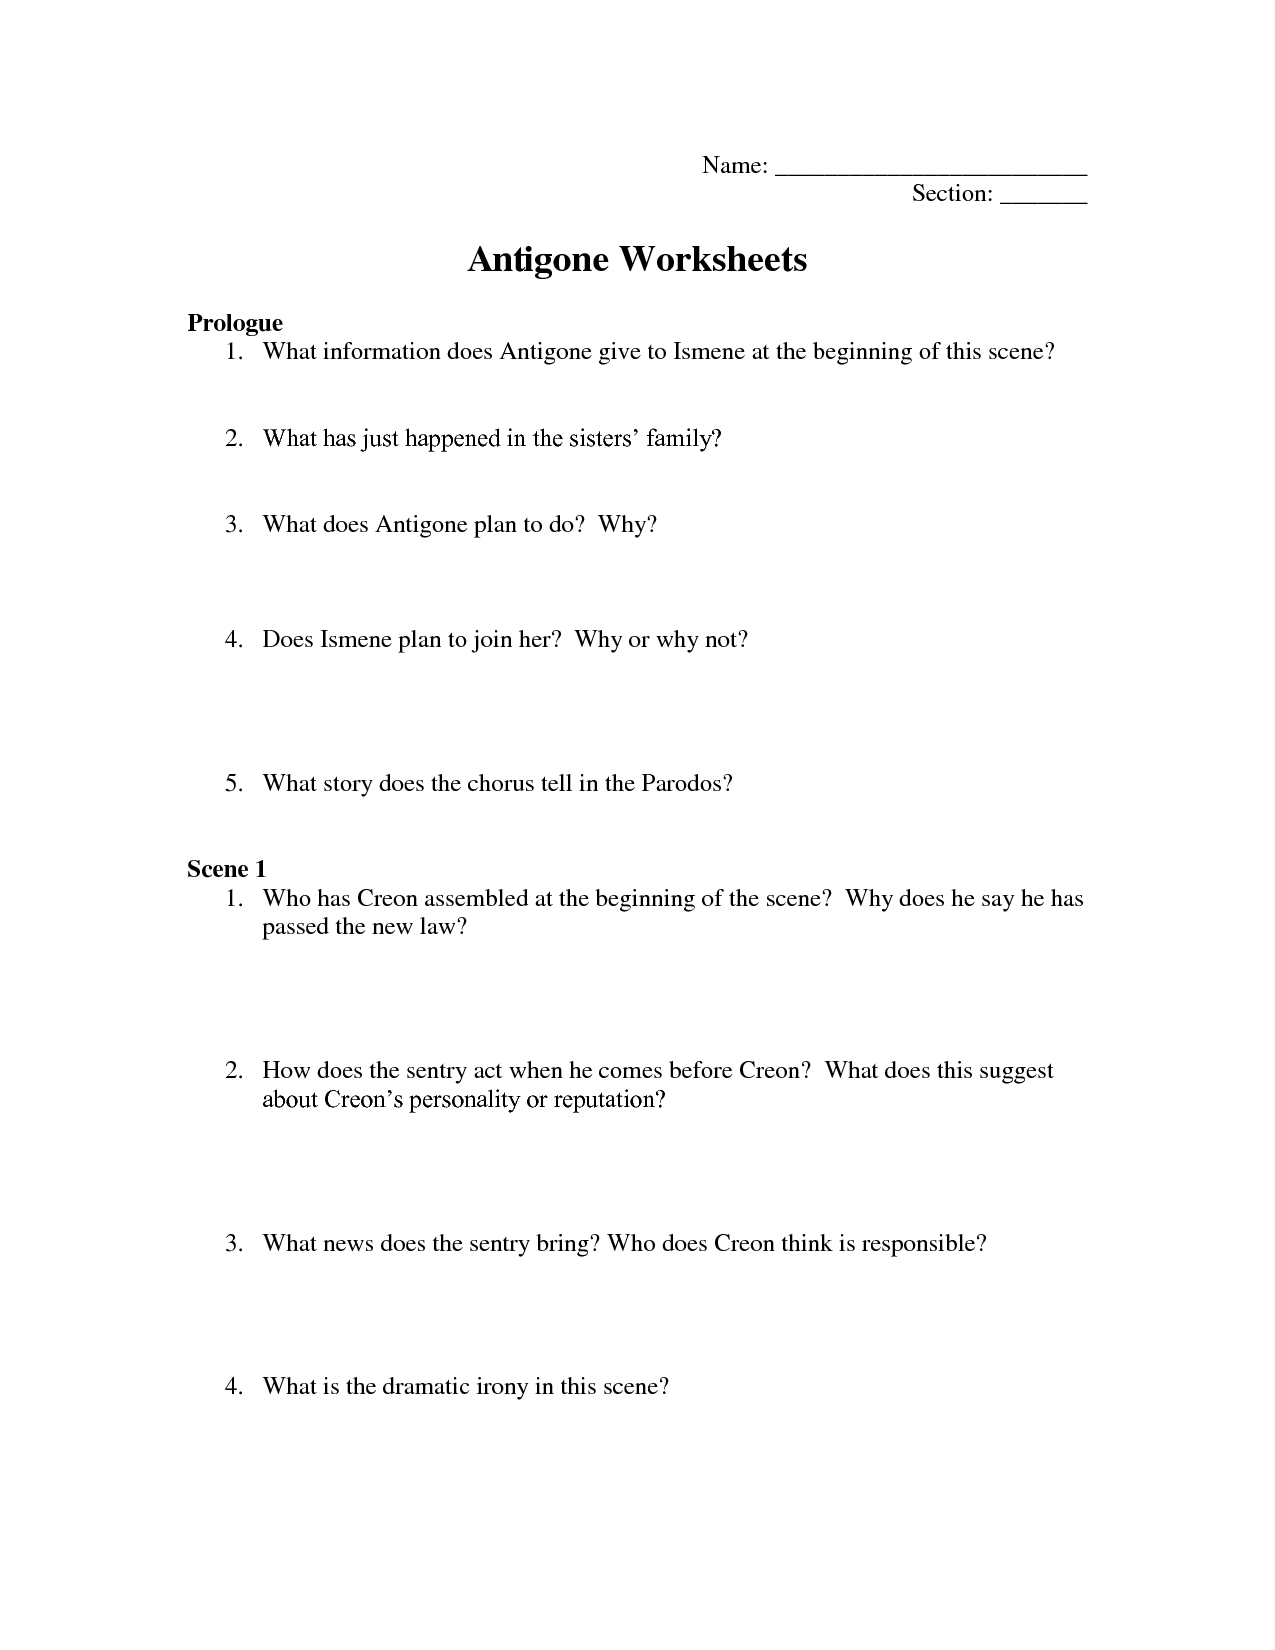 Antigone Worksheets Answers Here Saz